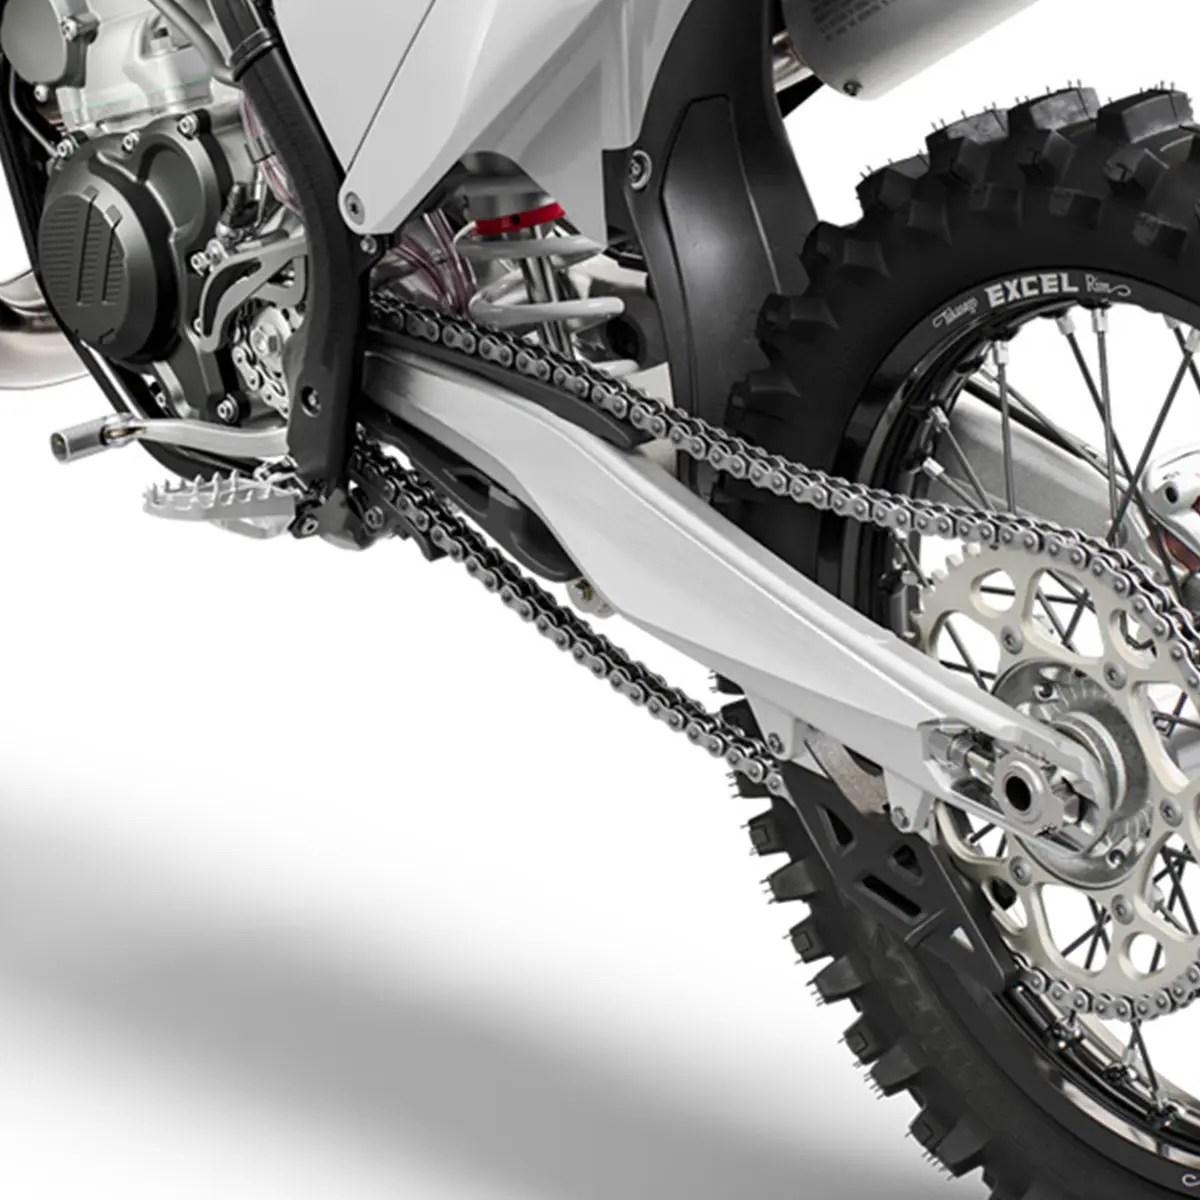 bras-oscillant-250-SX-2020